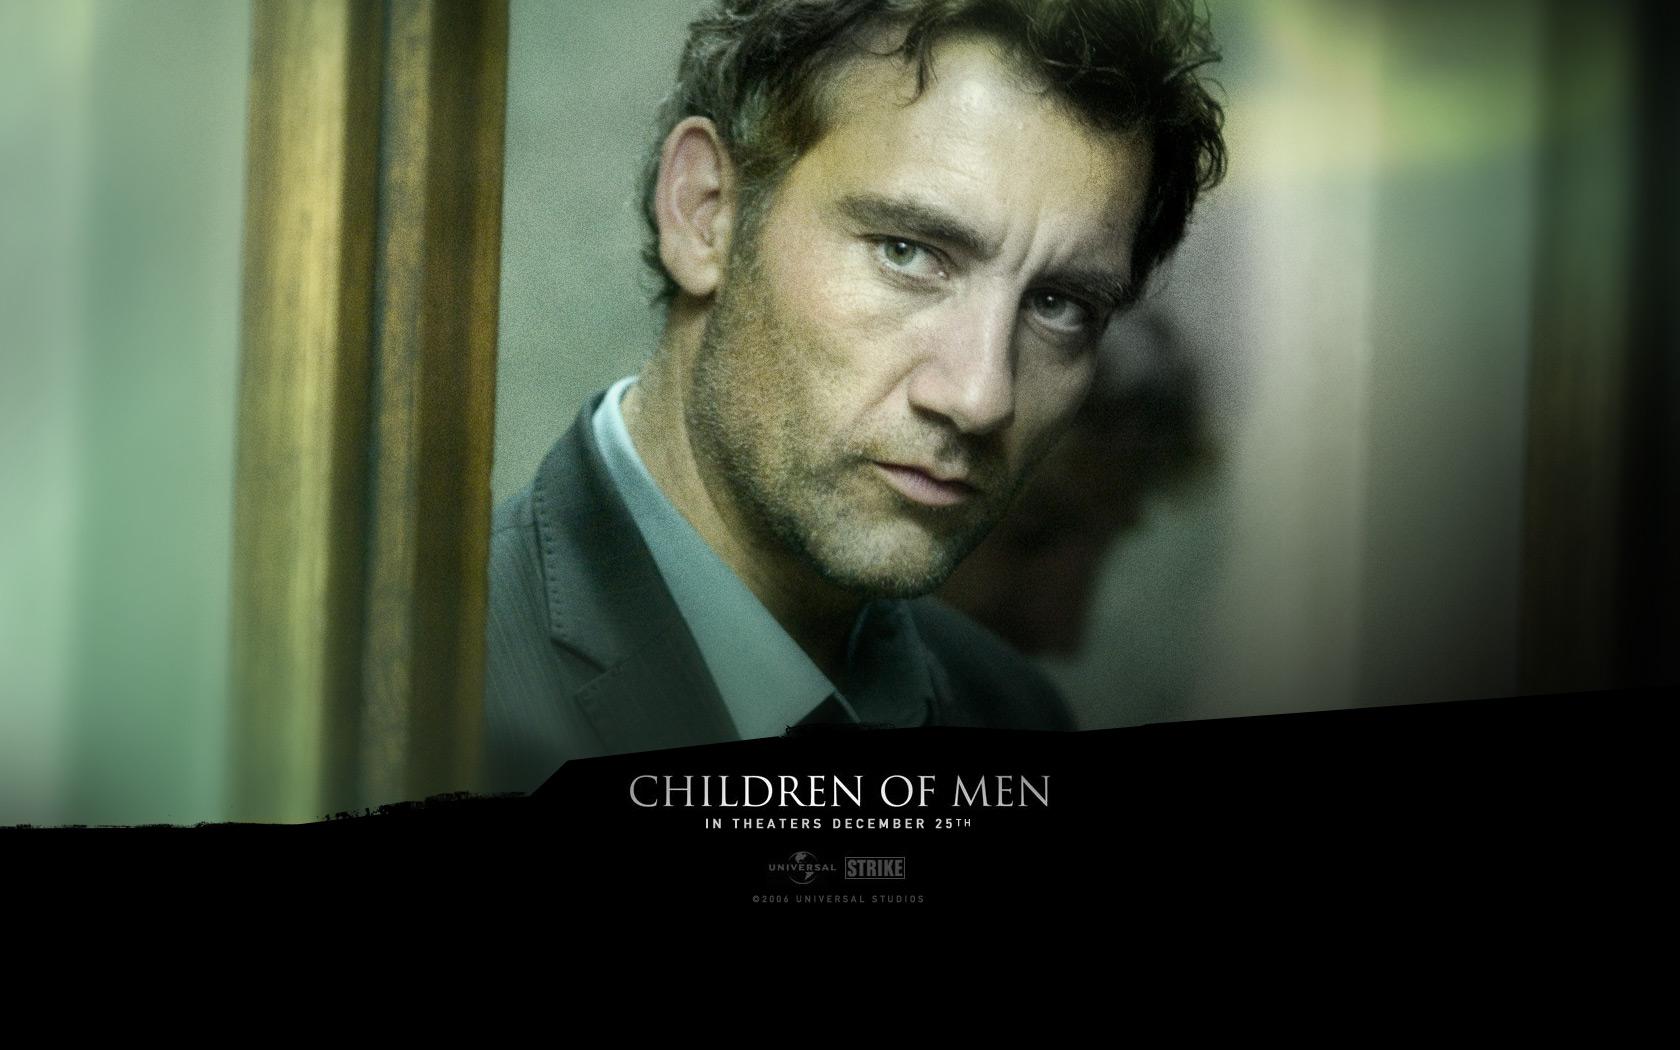 Children Of Men Wallpaper: Clive Owen Images Clive Owne